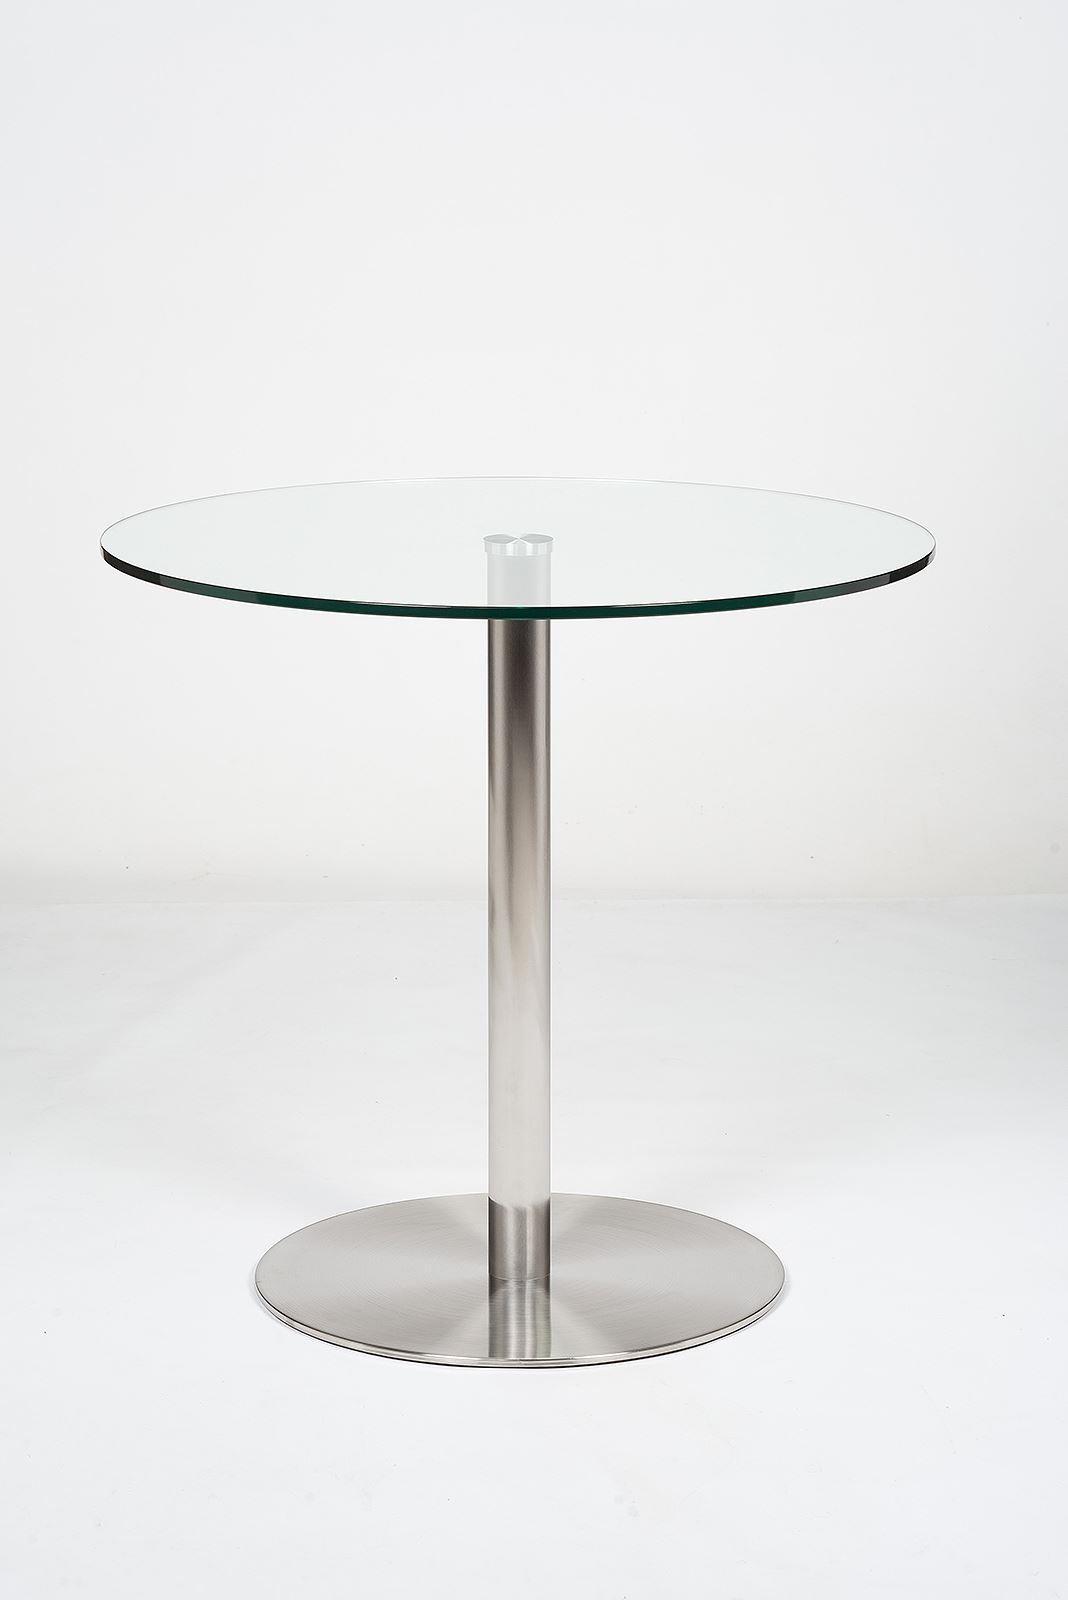 Target 80cm Glass Dining Table Modern Furniture Direc